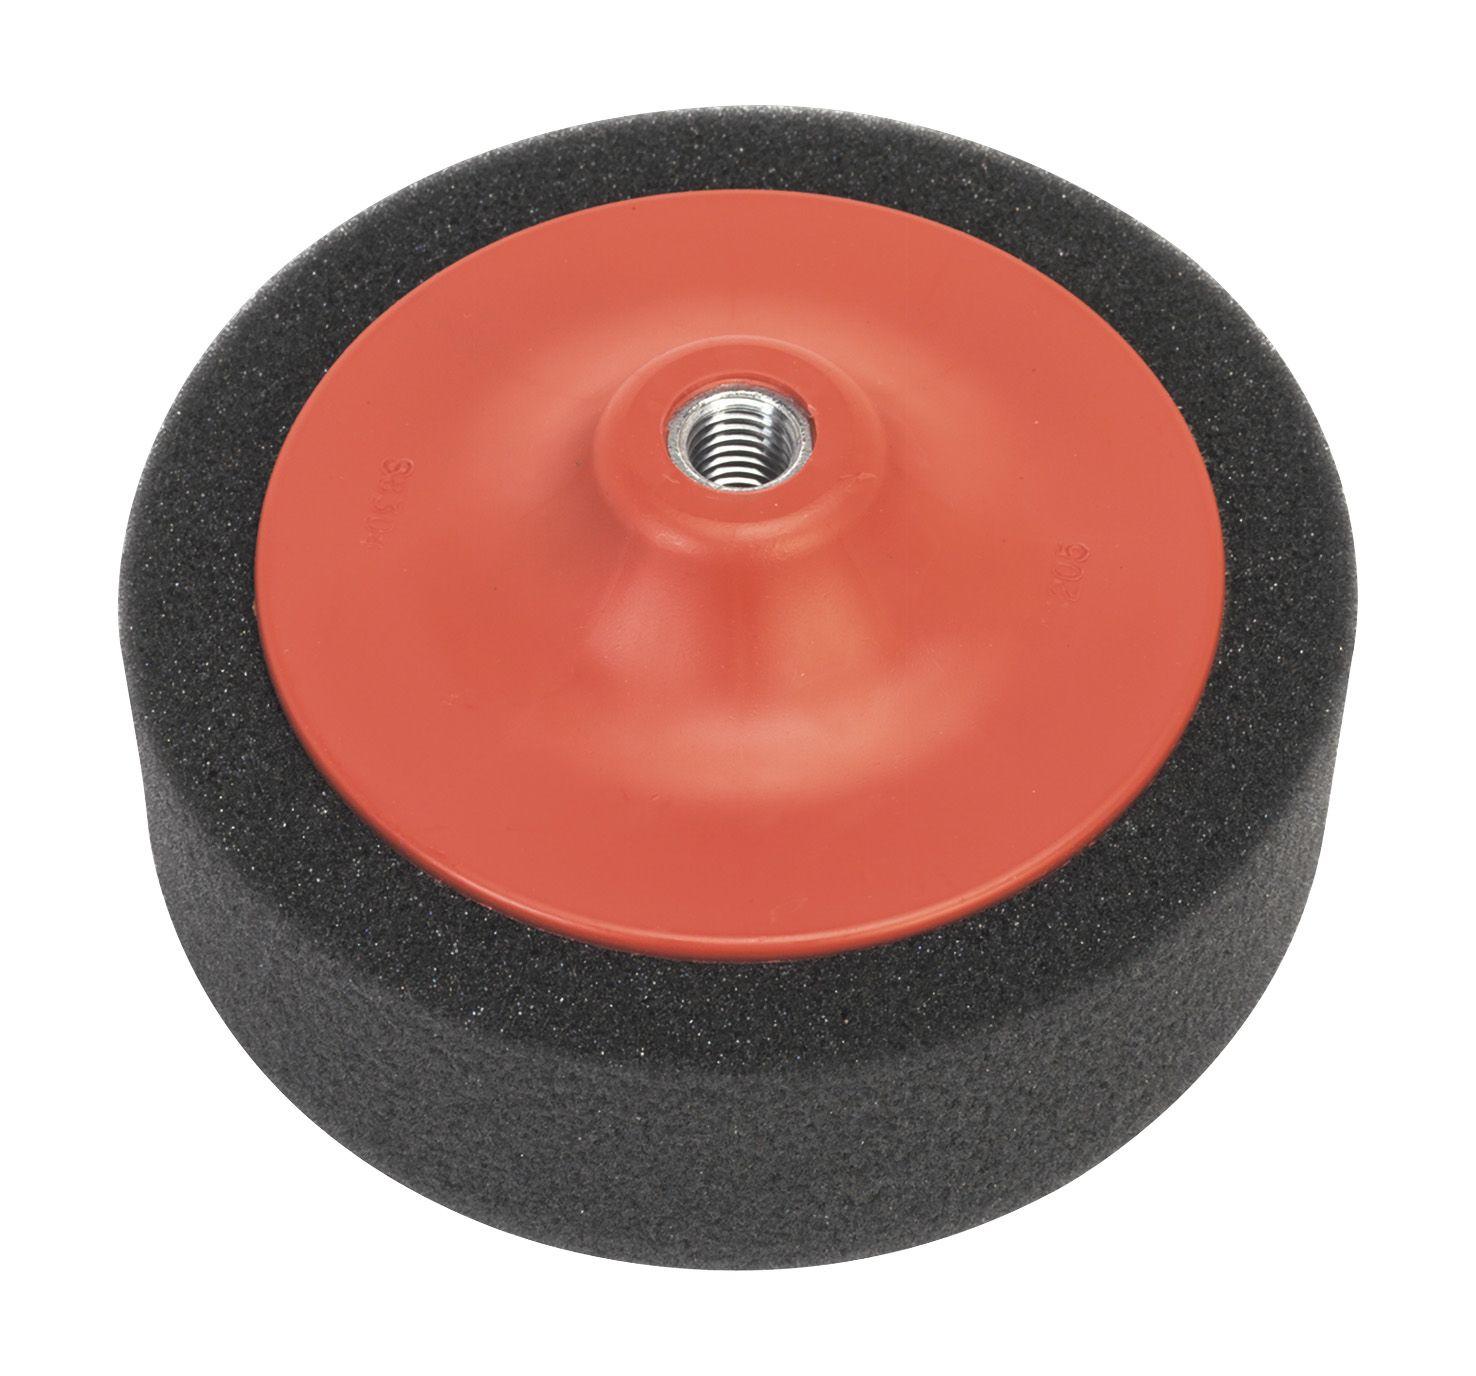 Sealey Buffing & Polishing Foam Heads 150 x 50mm M14 x 2mm